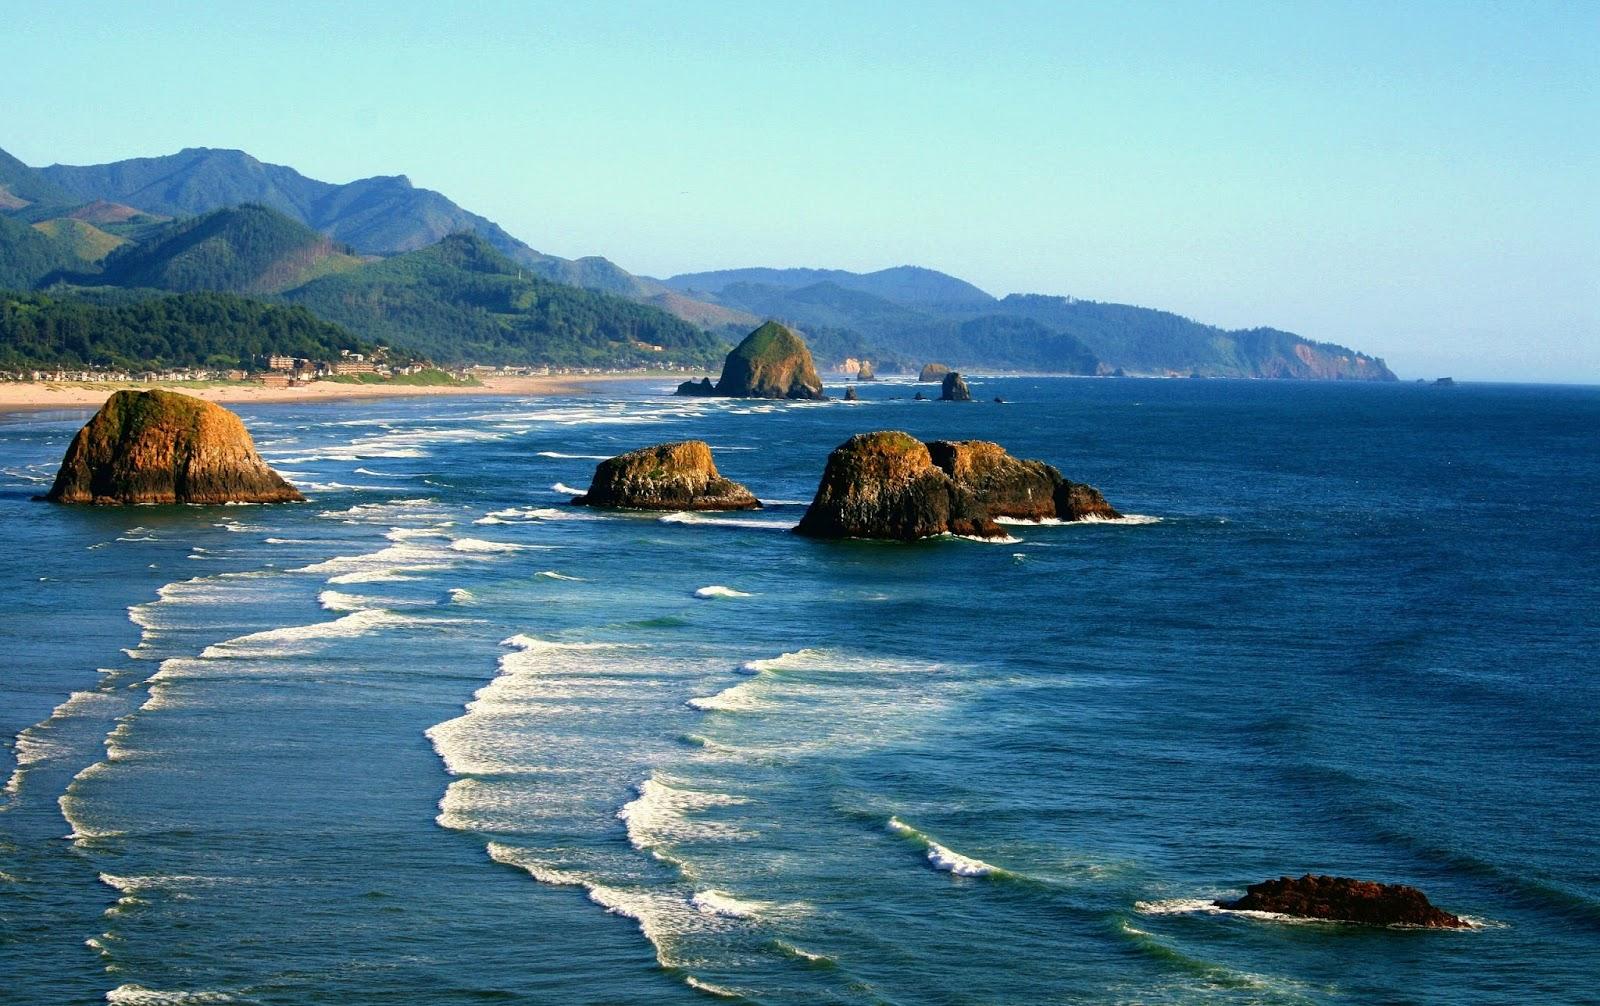 Oregonin Pääkaupunki